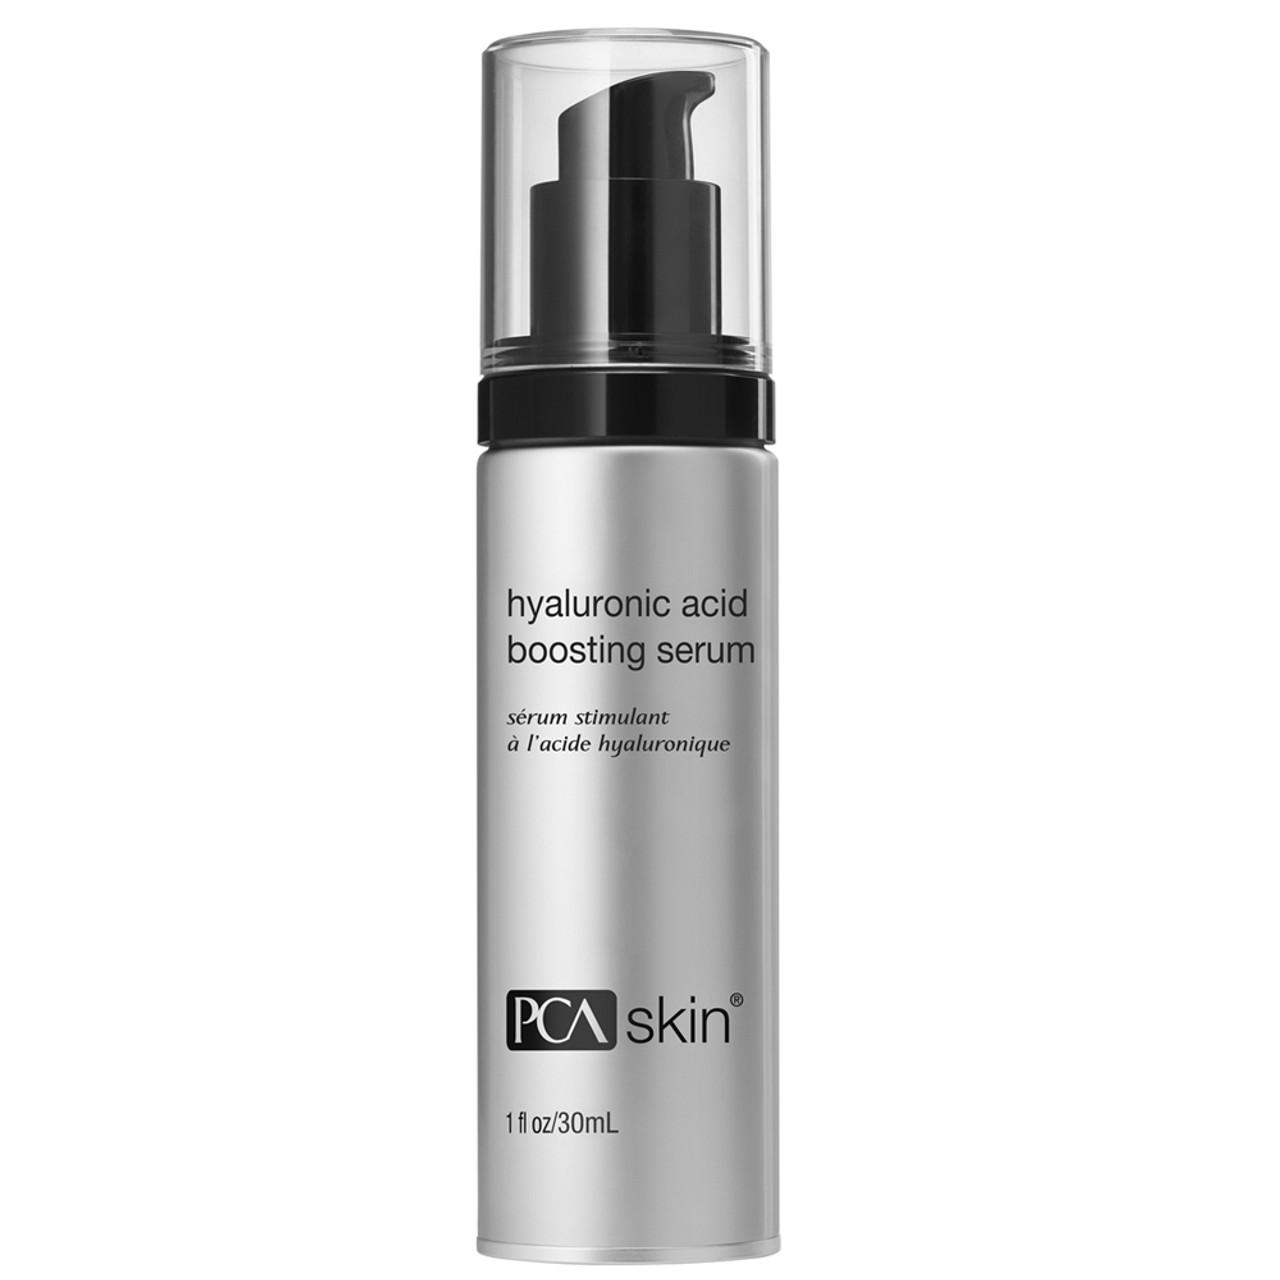 PCA Skin Hyaluronic Acid Boosting Serum 1oz